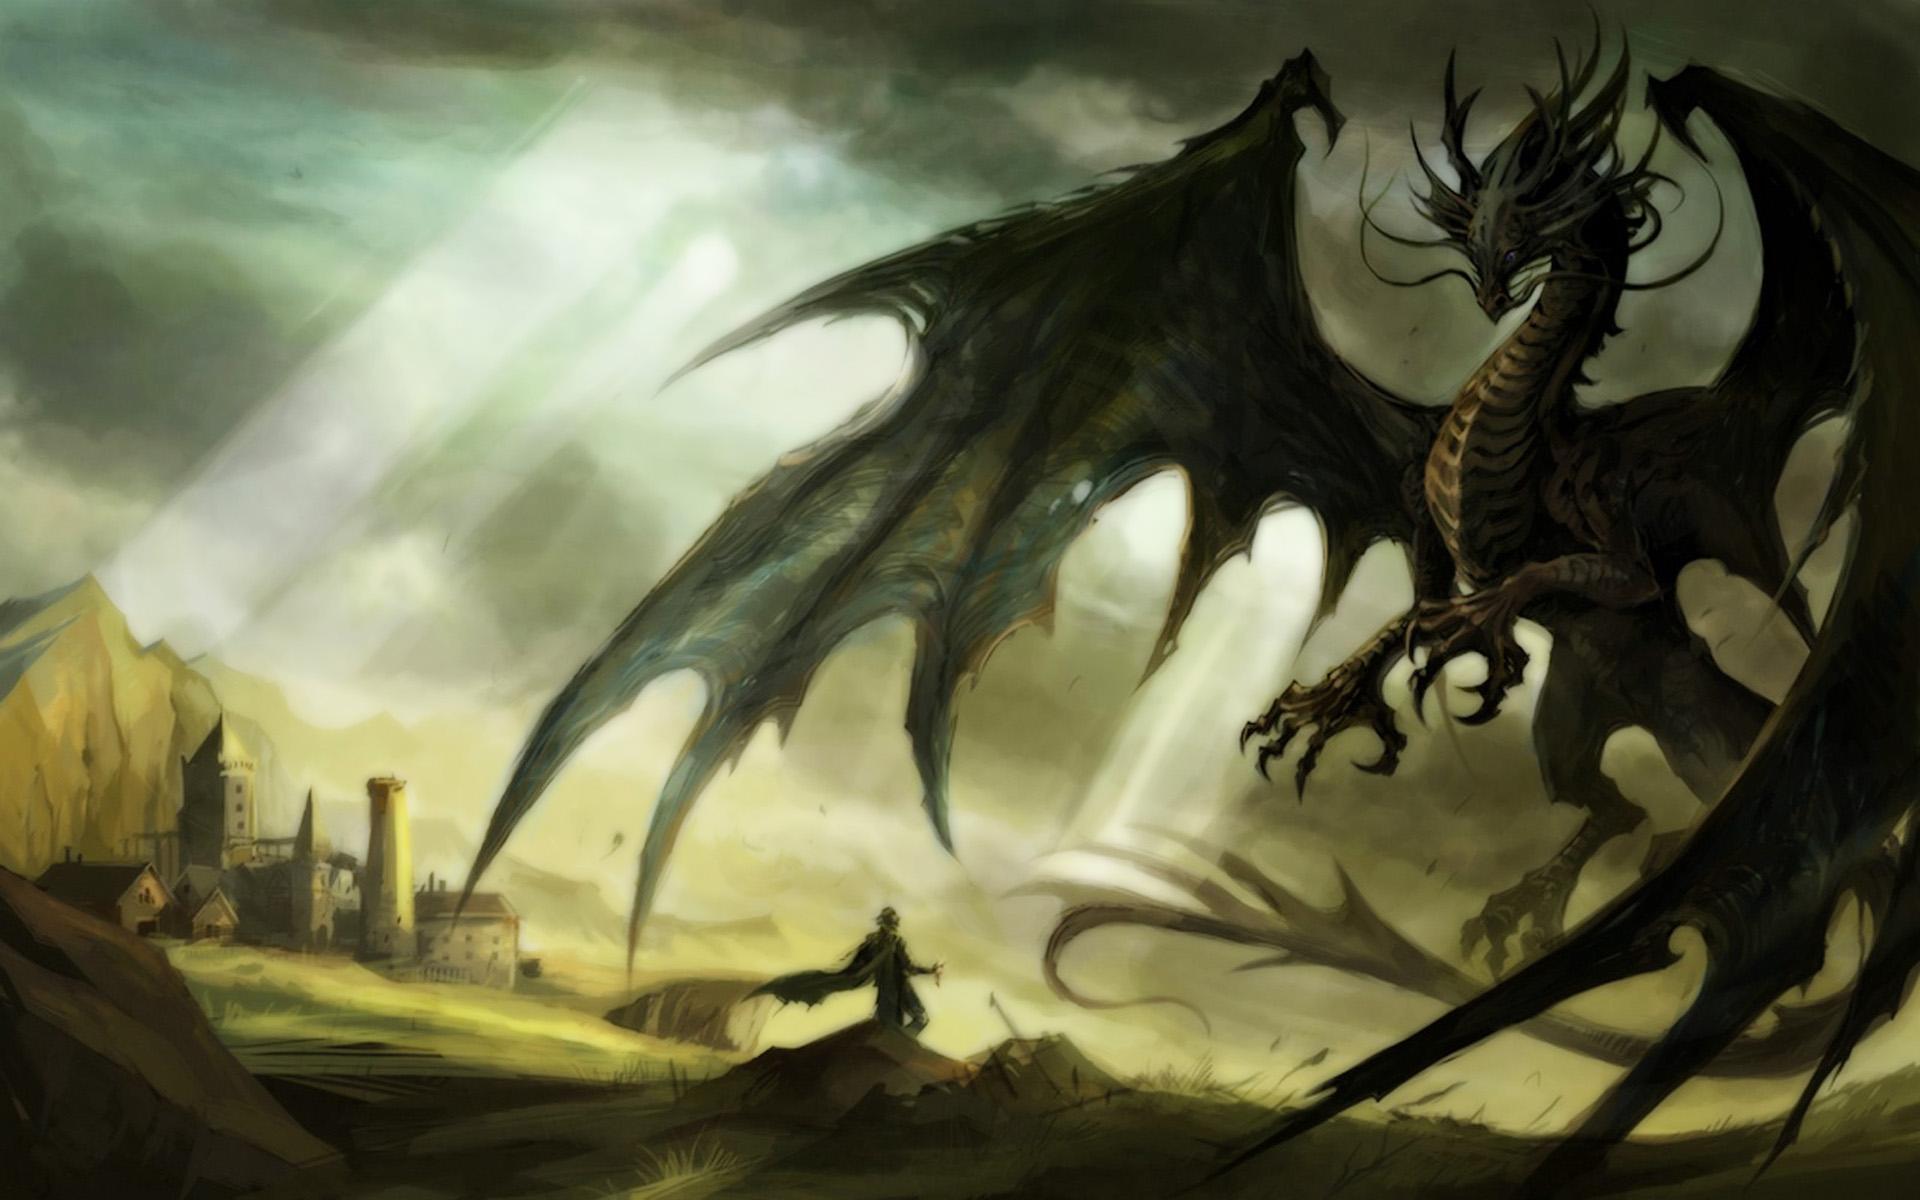 dragon hd wallpaper | background image | 1920x1200 | id:168265